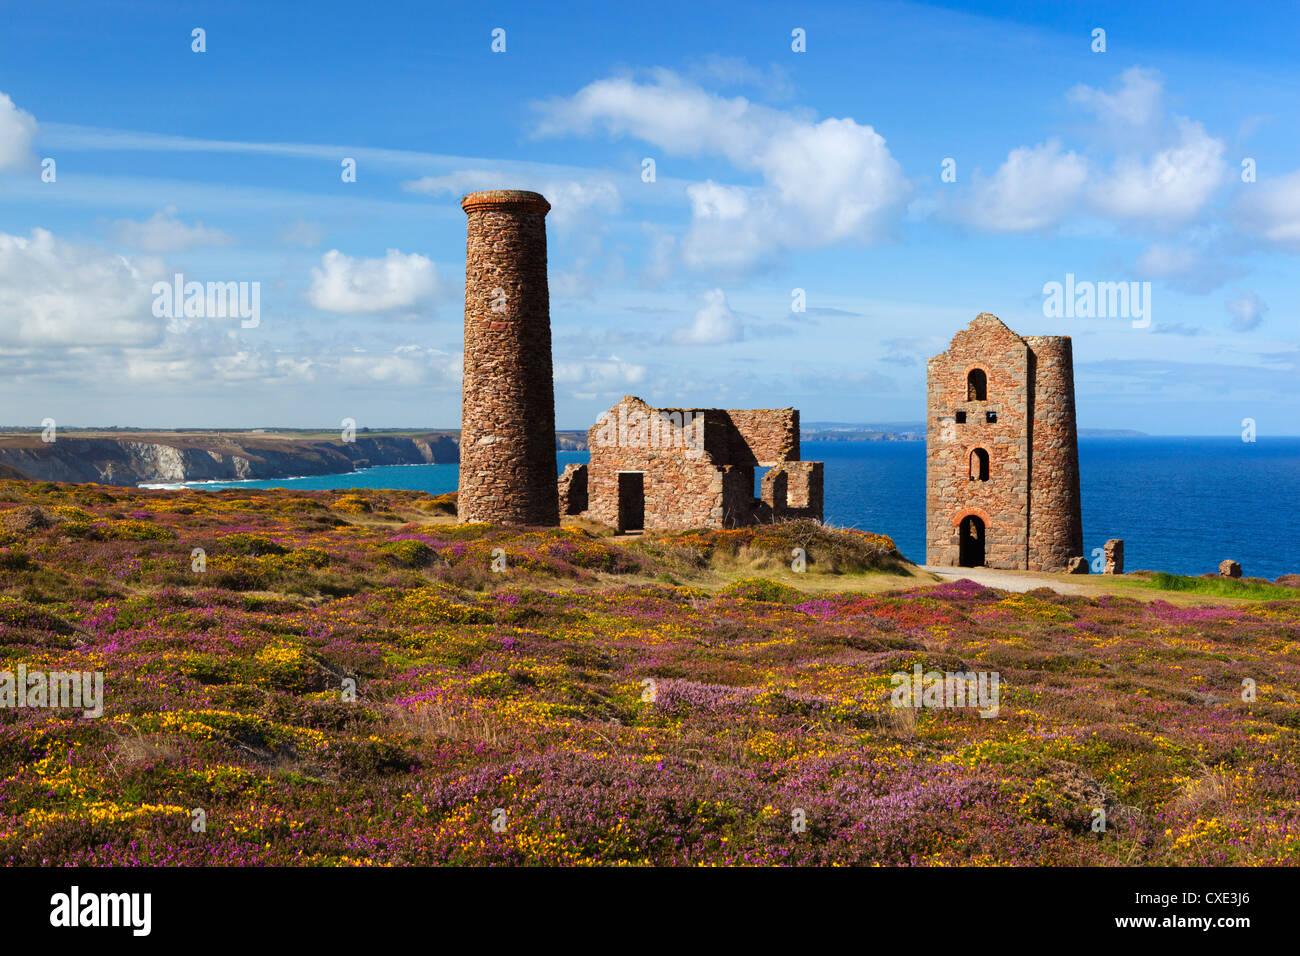 Ruins of Wheal Coates Tin Mine engine house, near St Agnes, Cornwall, England - Stock Image